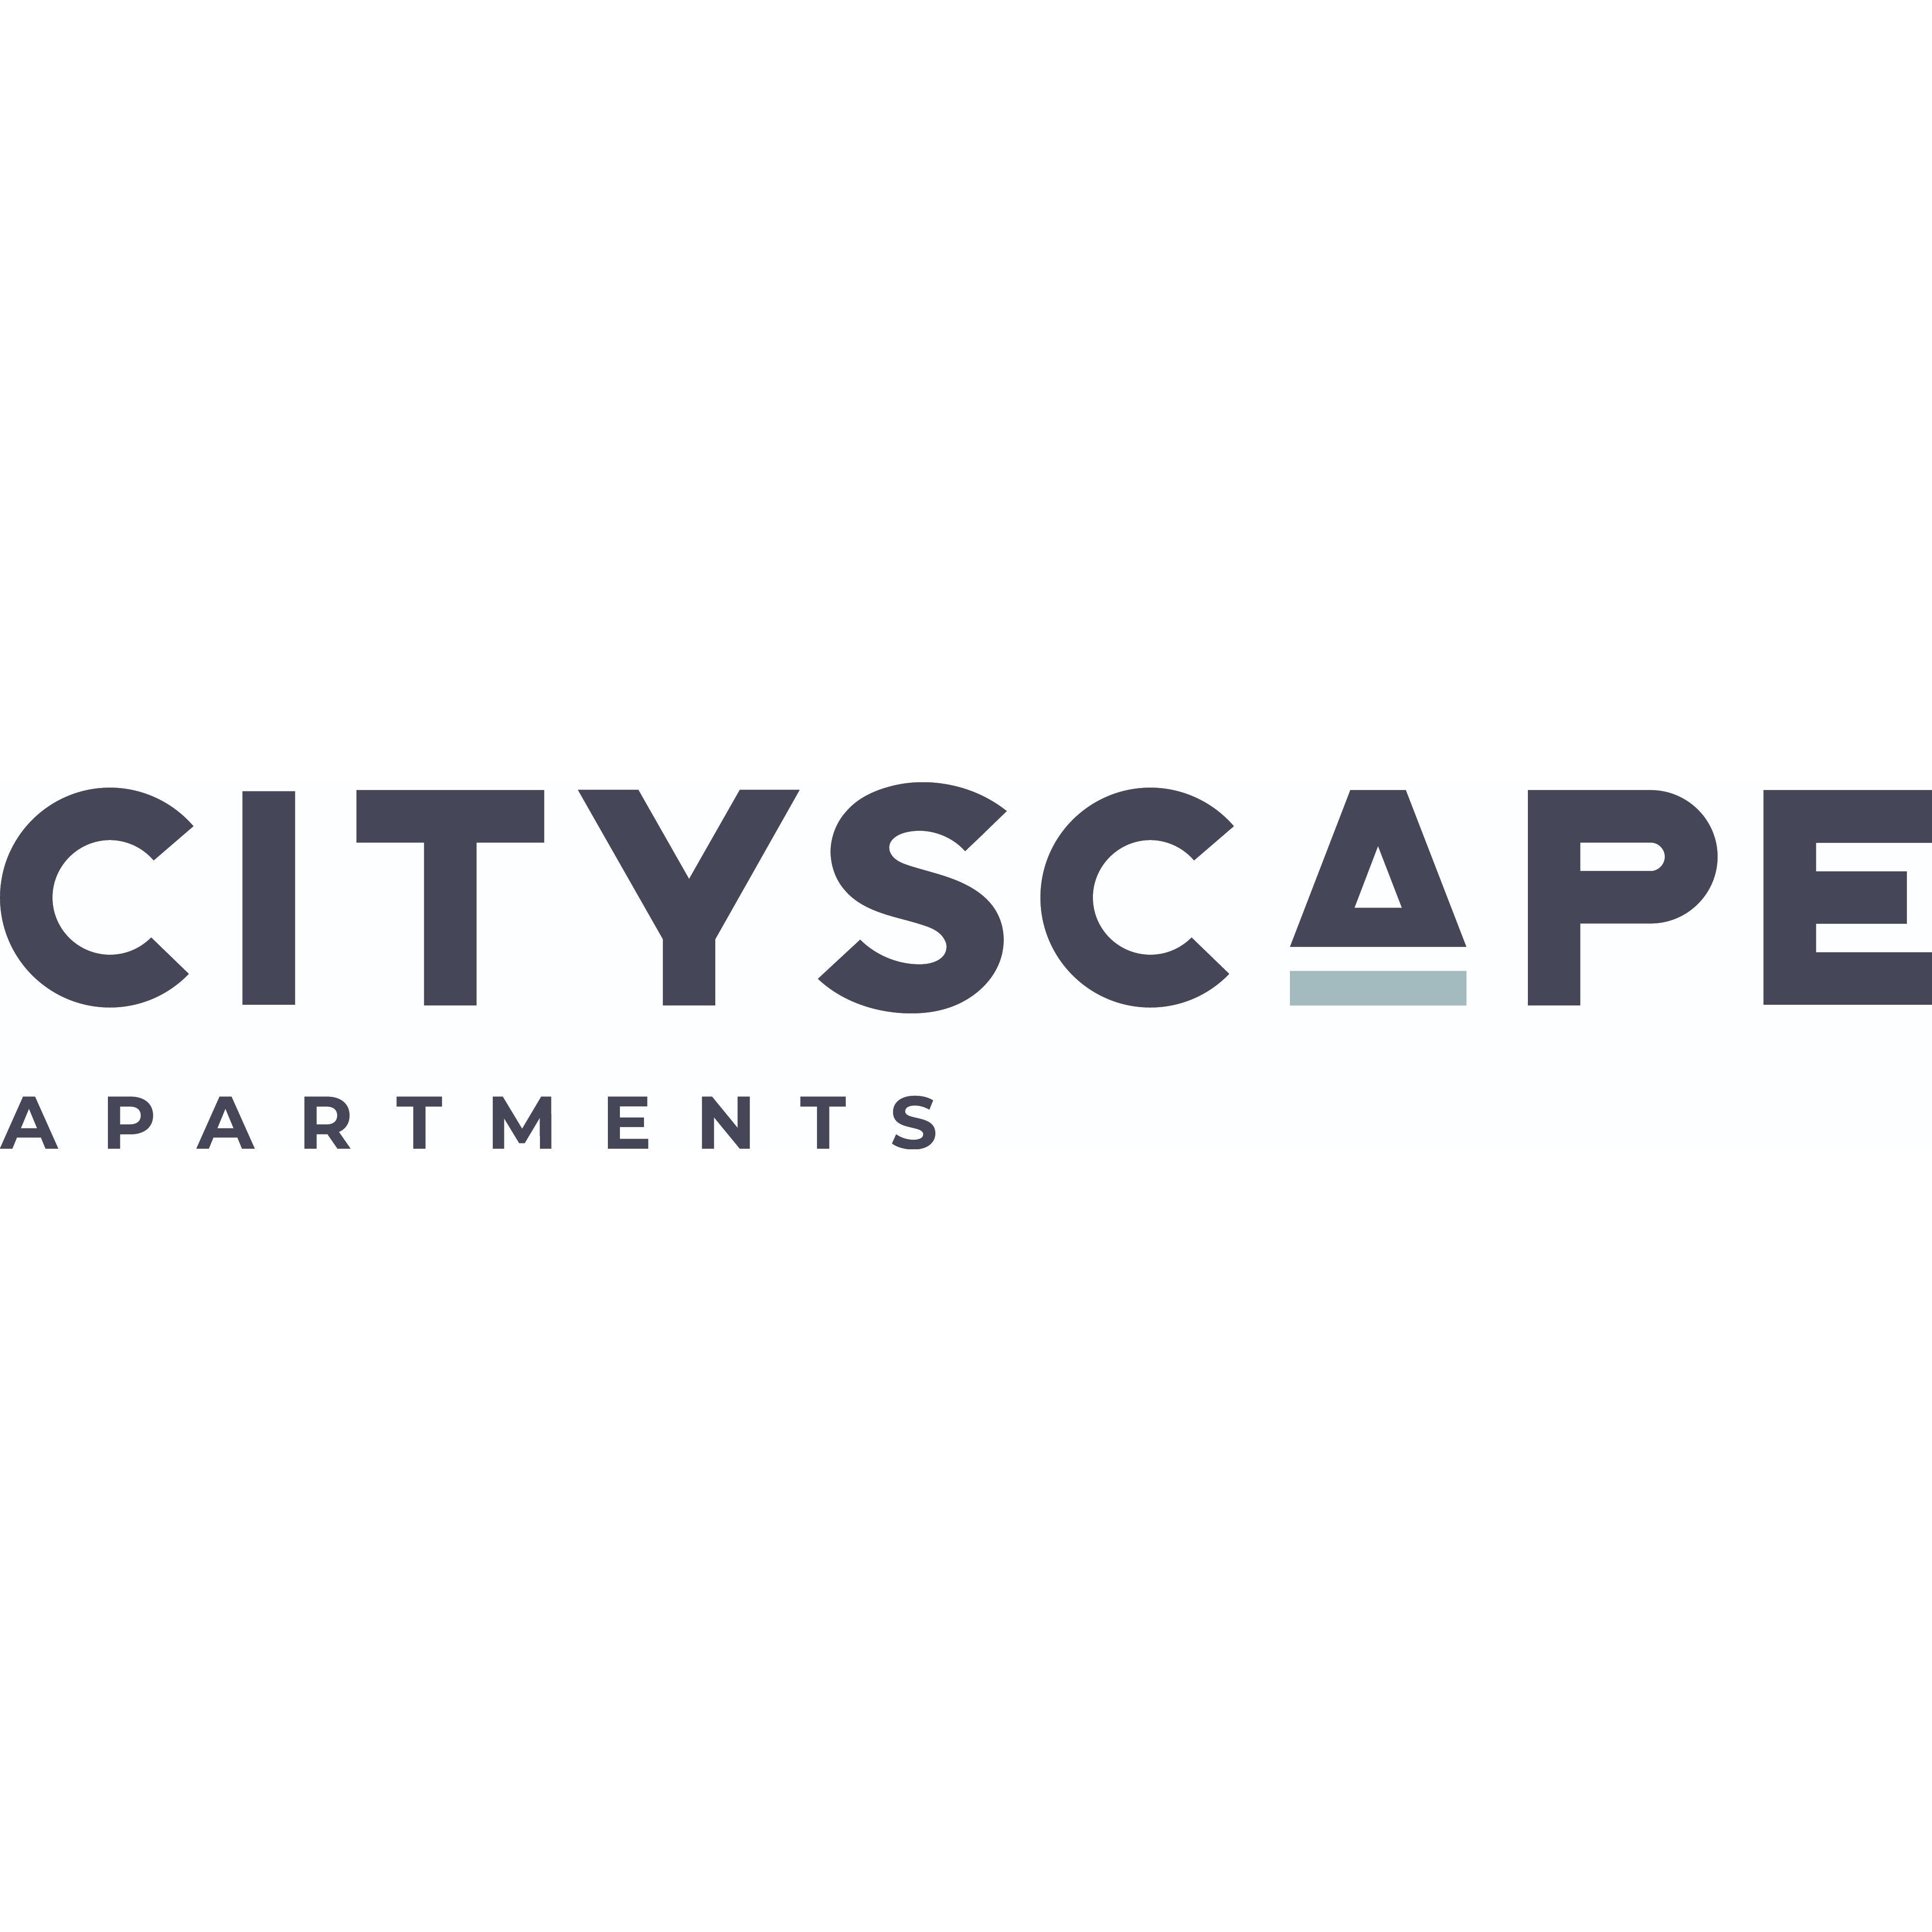 CityScape Apartments image 2